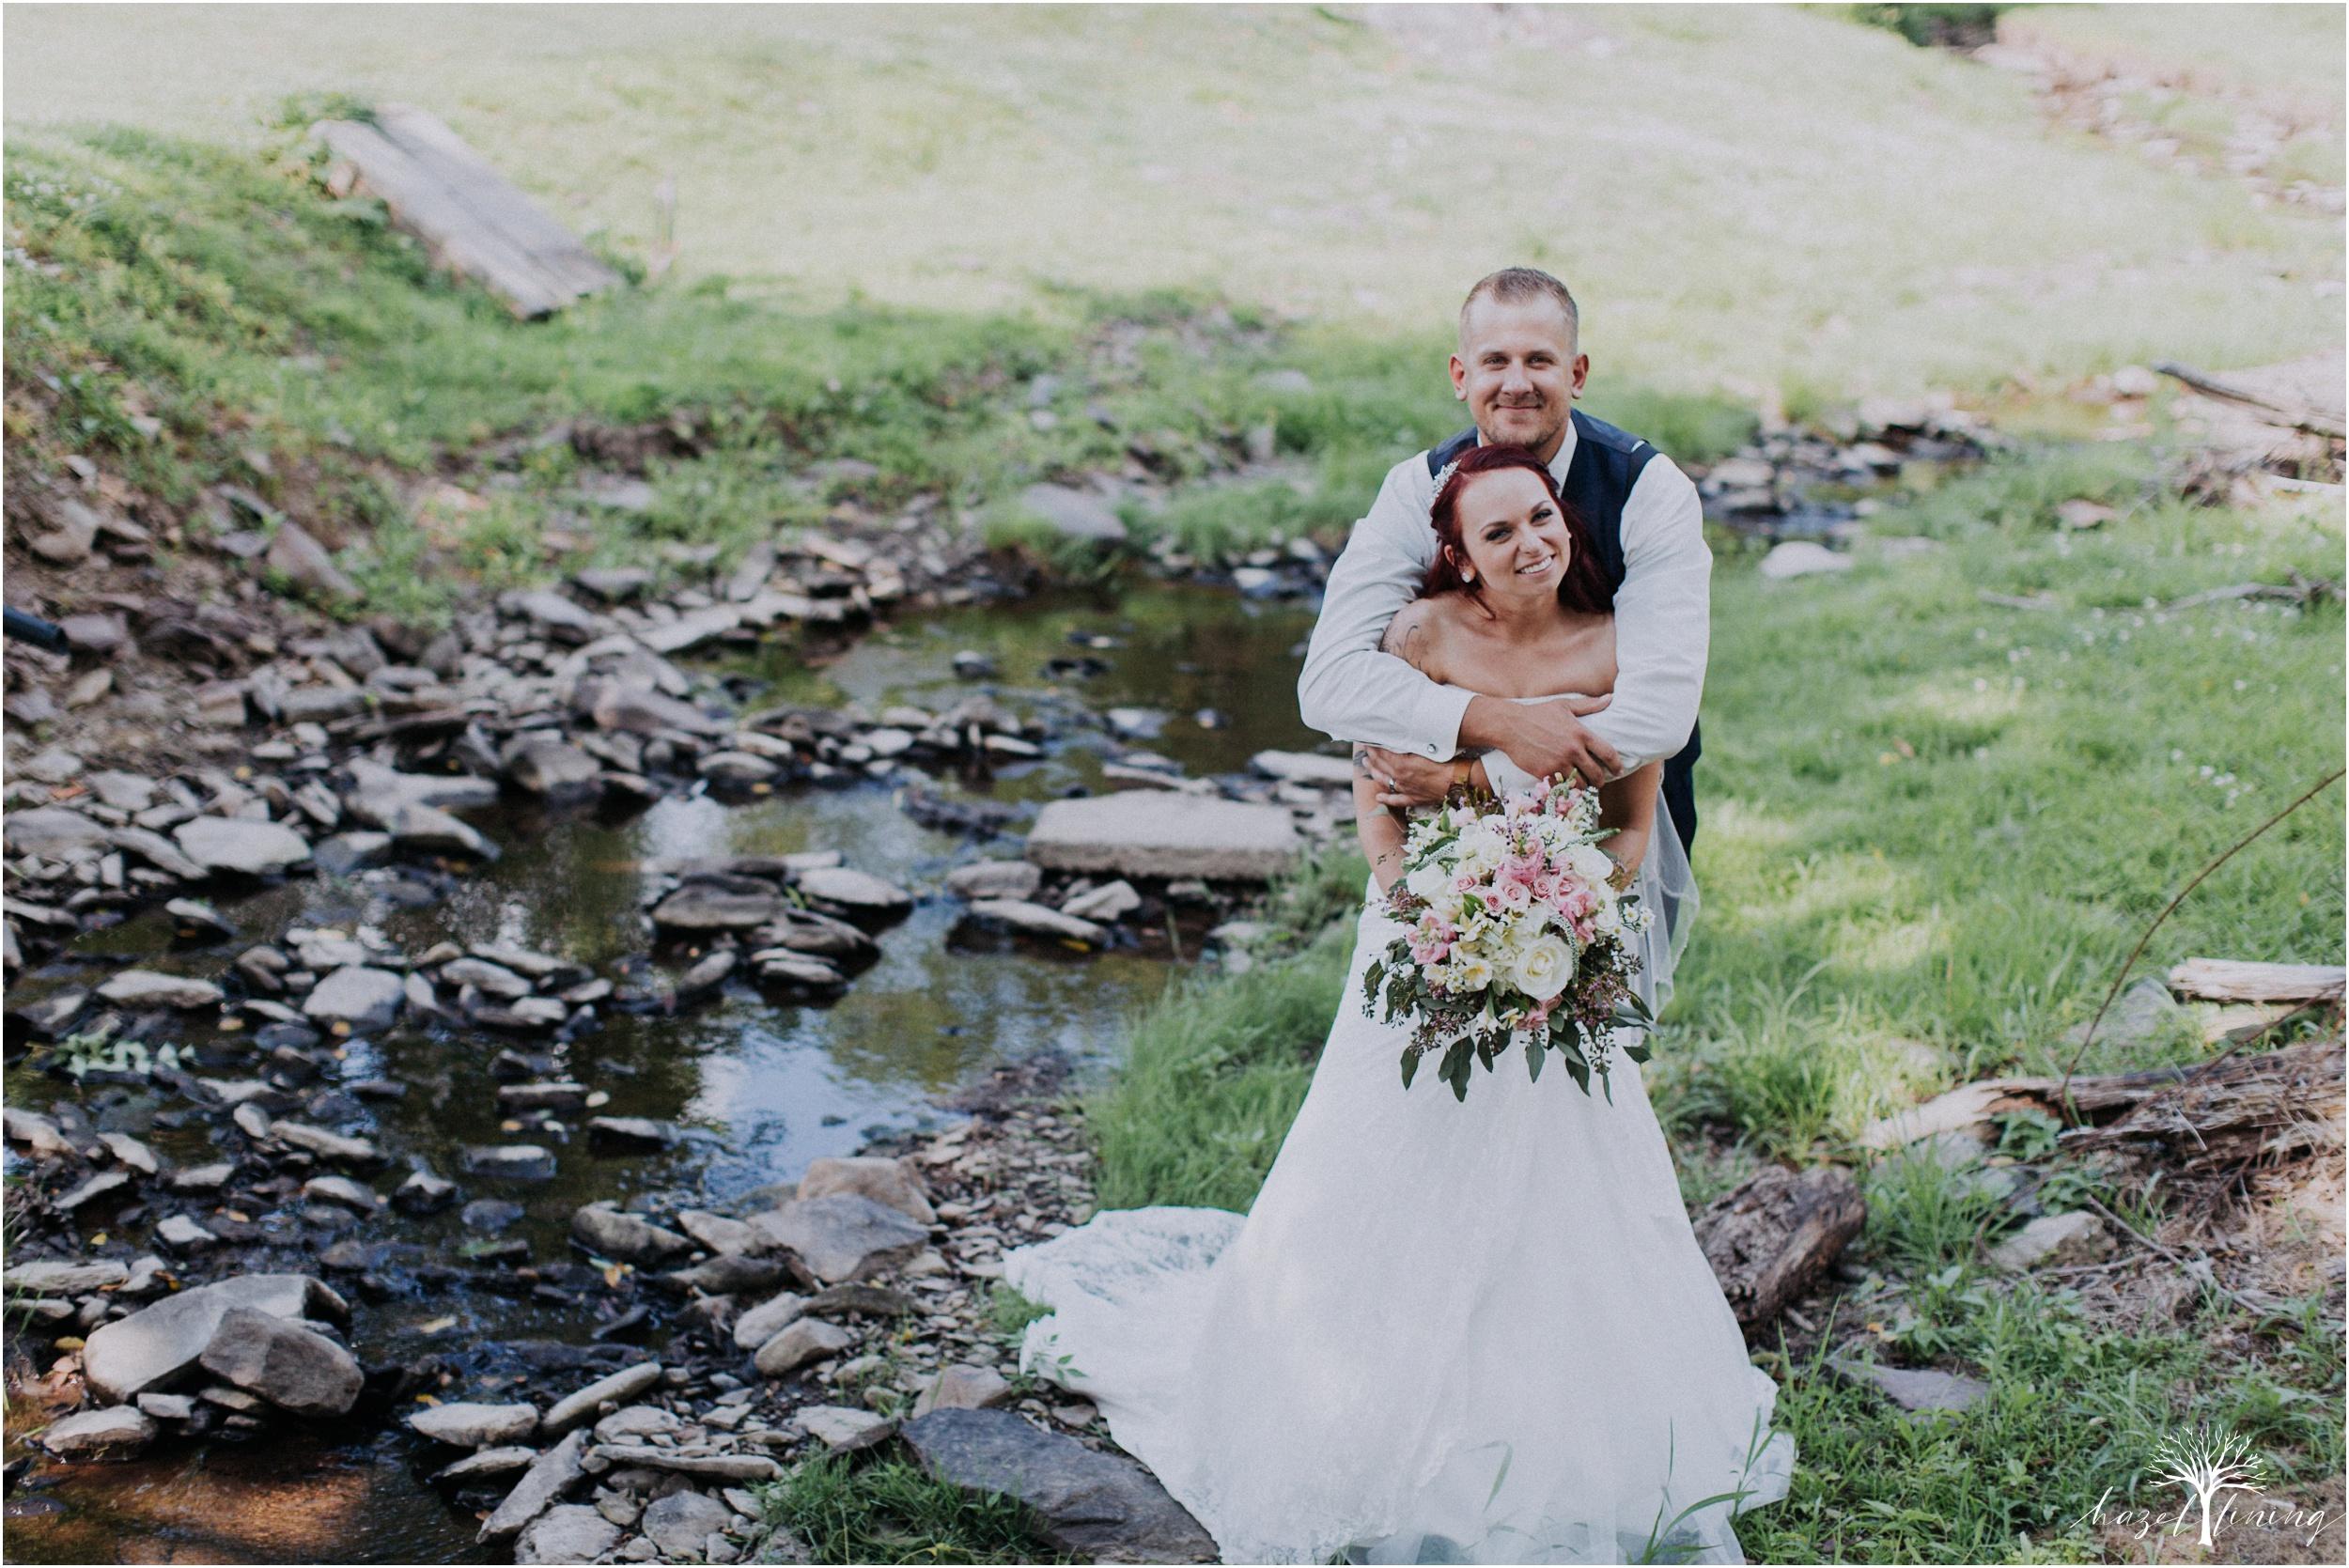 alyssa-james-stiteler-wedding-loft-and-sweet-water-cc-pennsburg-pennsylvania-hazel-lining-travel-wedding-elopement-photography_0092.jpg